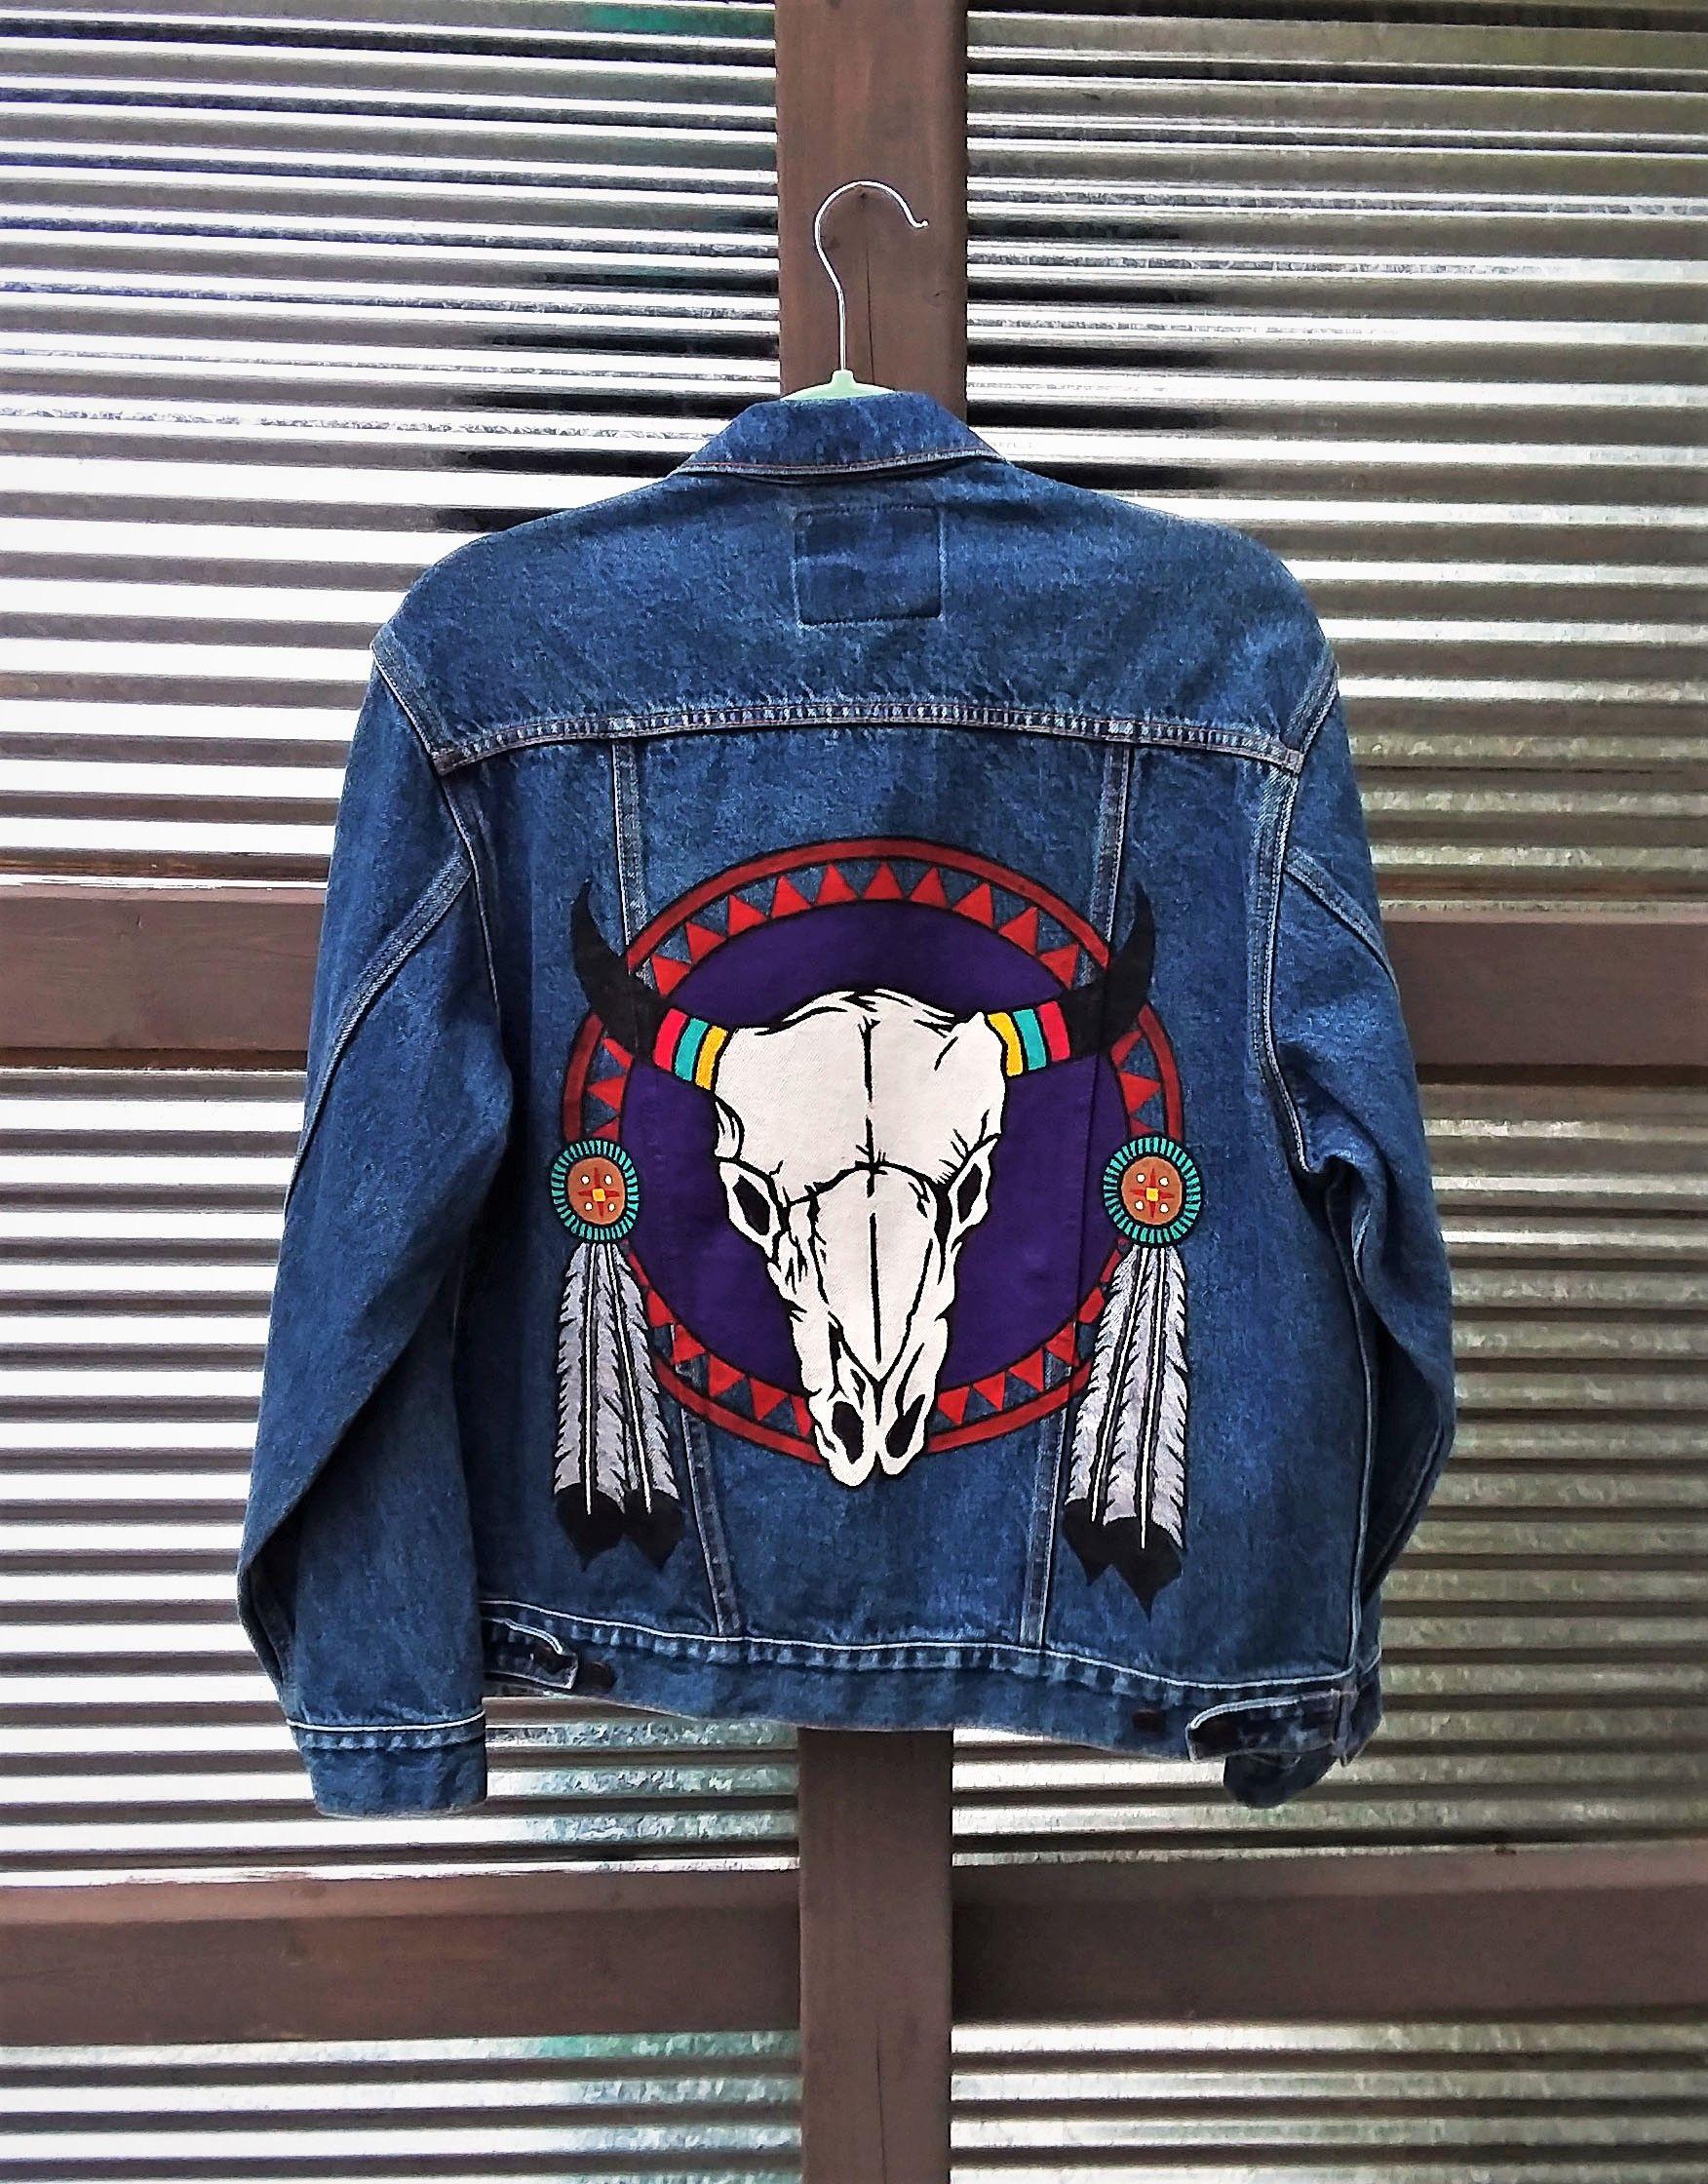 Hand Painted Southwest Cow Skull On Denim Levi S Jean Jacket By Bleudoor On Instagram Hand Painted Denim Jacket Embellished Jacket Farm Clothes [ 2240 x 1752 Pixel ]